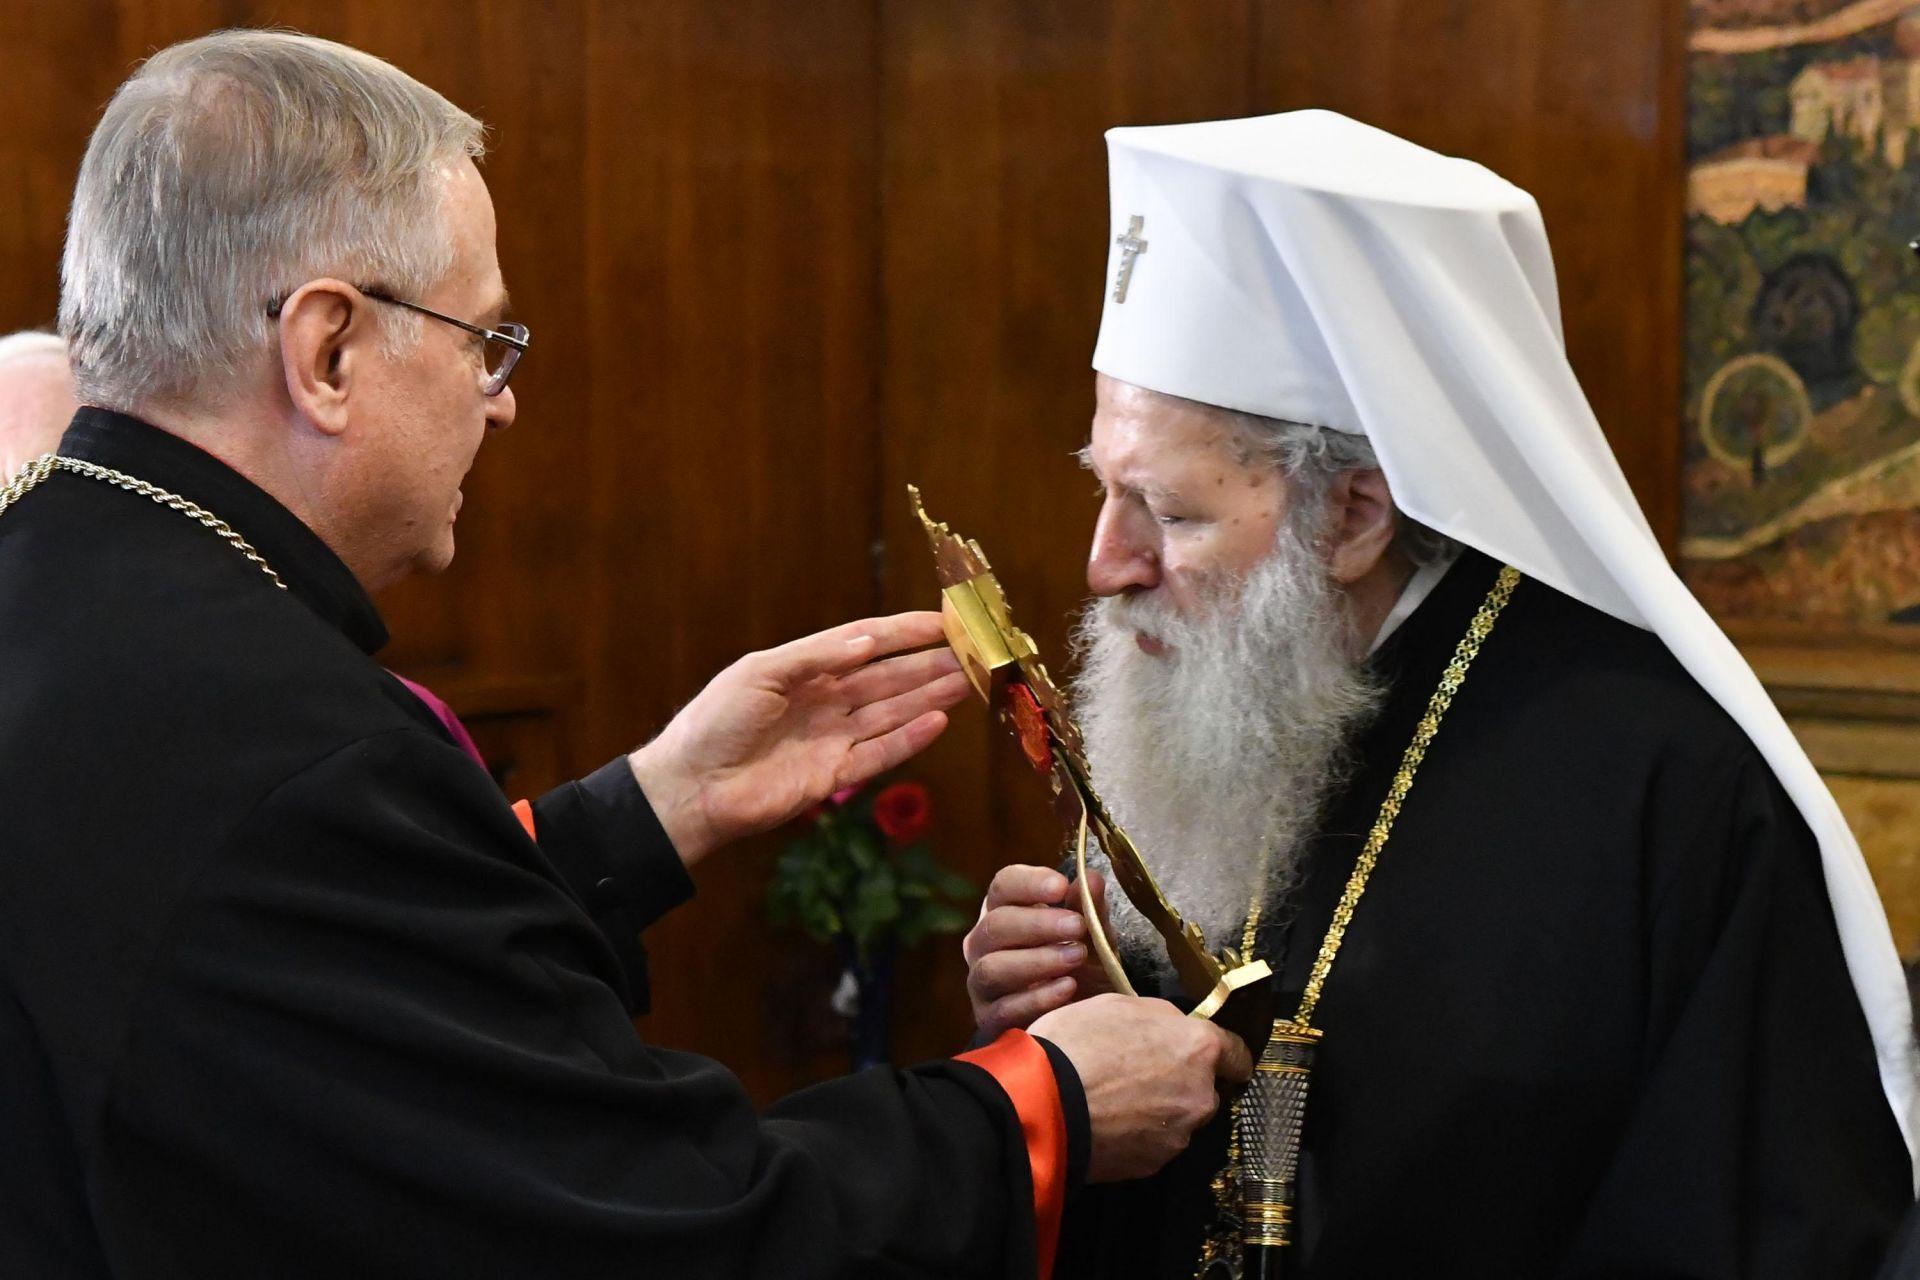 Епископ Христо Пройков връчва на патриарх Неофит мощите на свети Потит